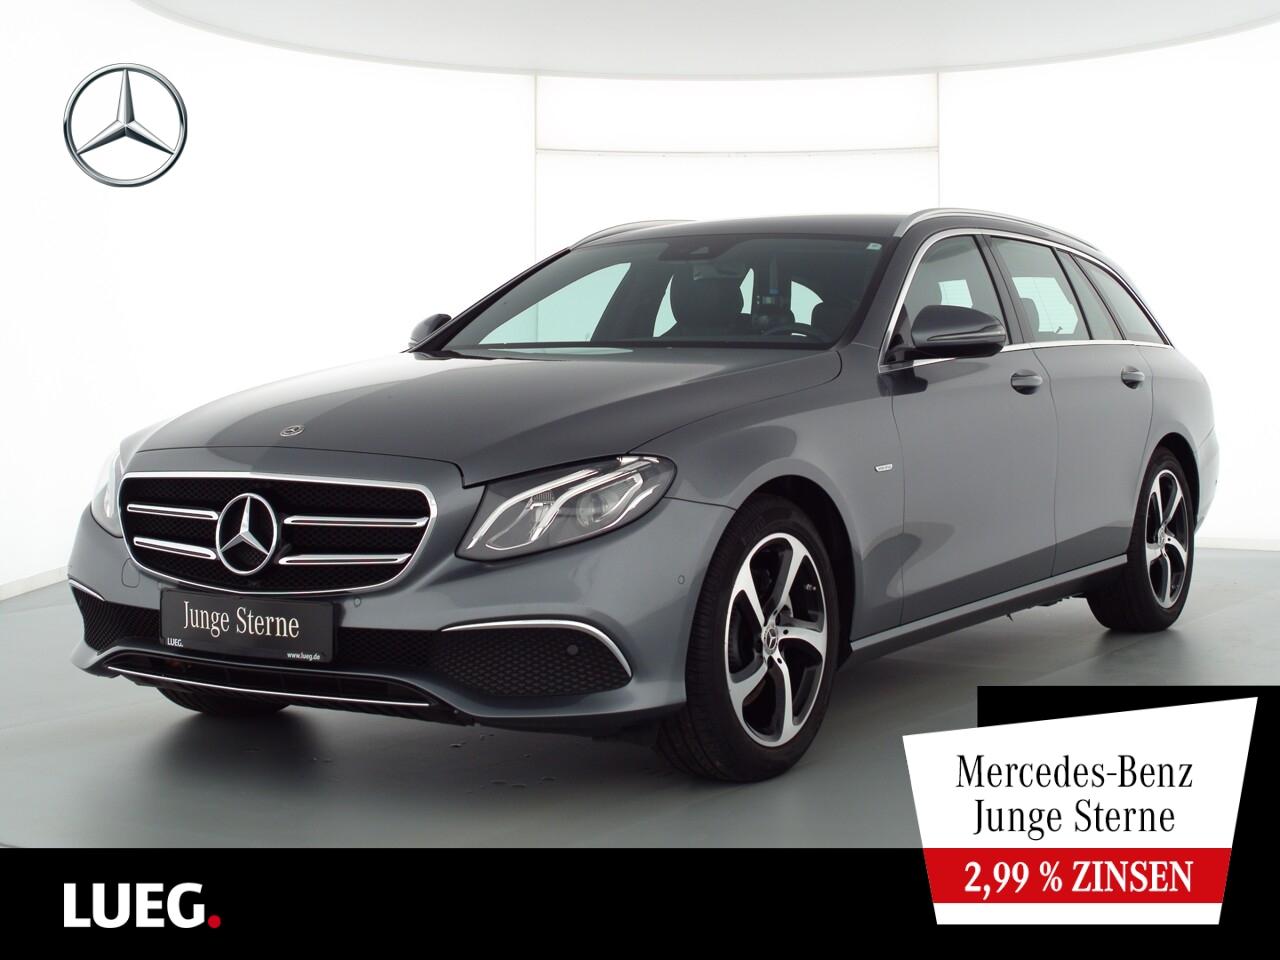 Mercedes-Benz E 200 T 4M Avantgarde+COM+LED-HP+SPORTSTYLE+RFK+, Jahr 2020, Benzin